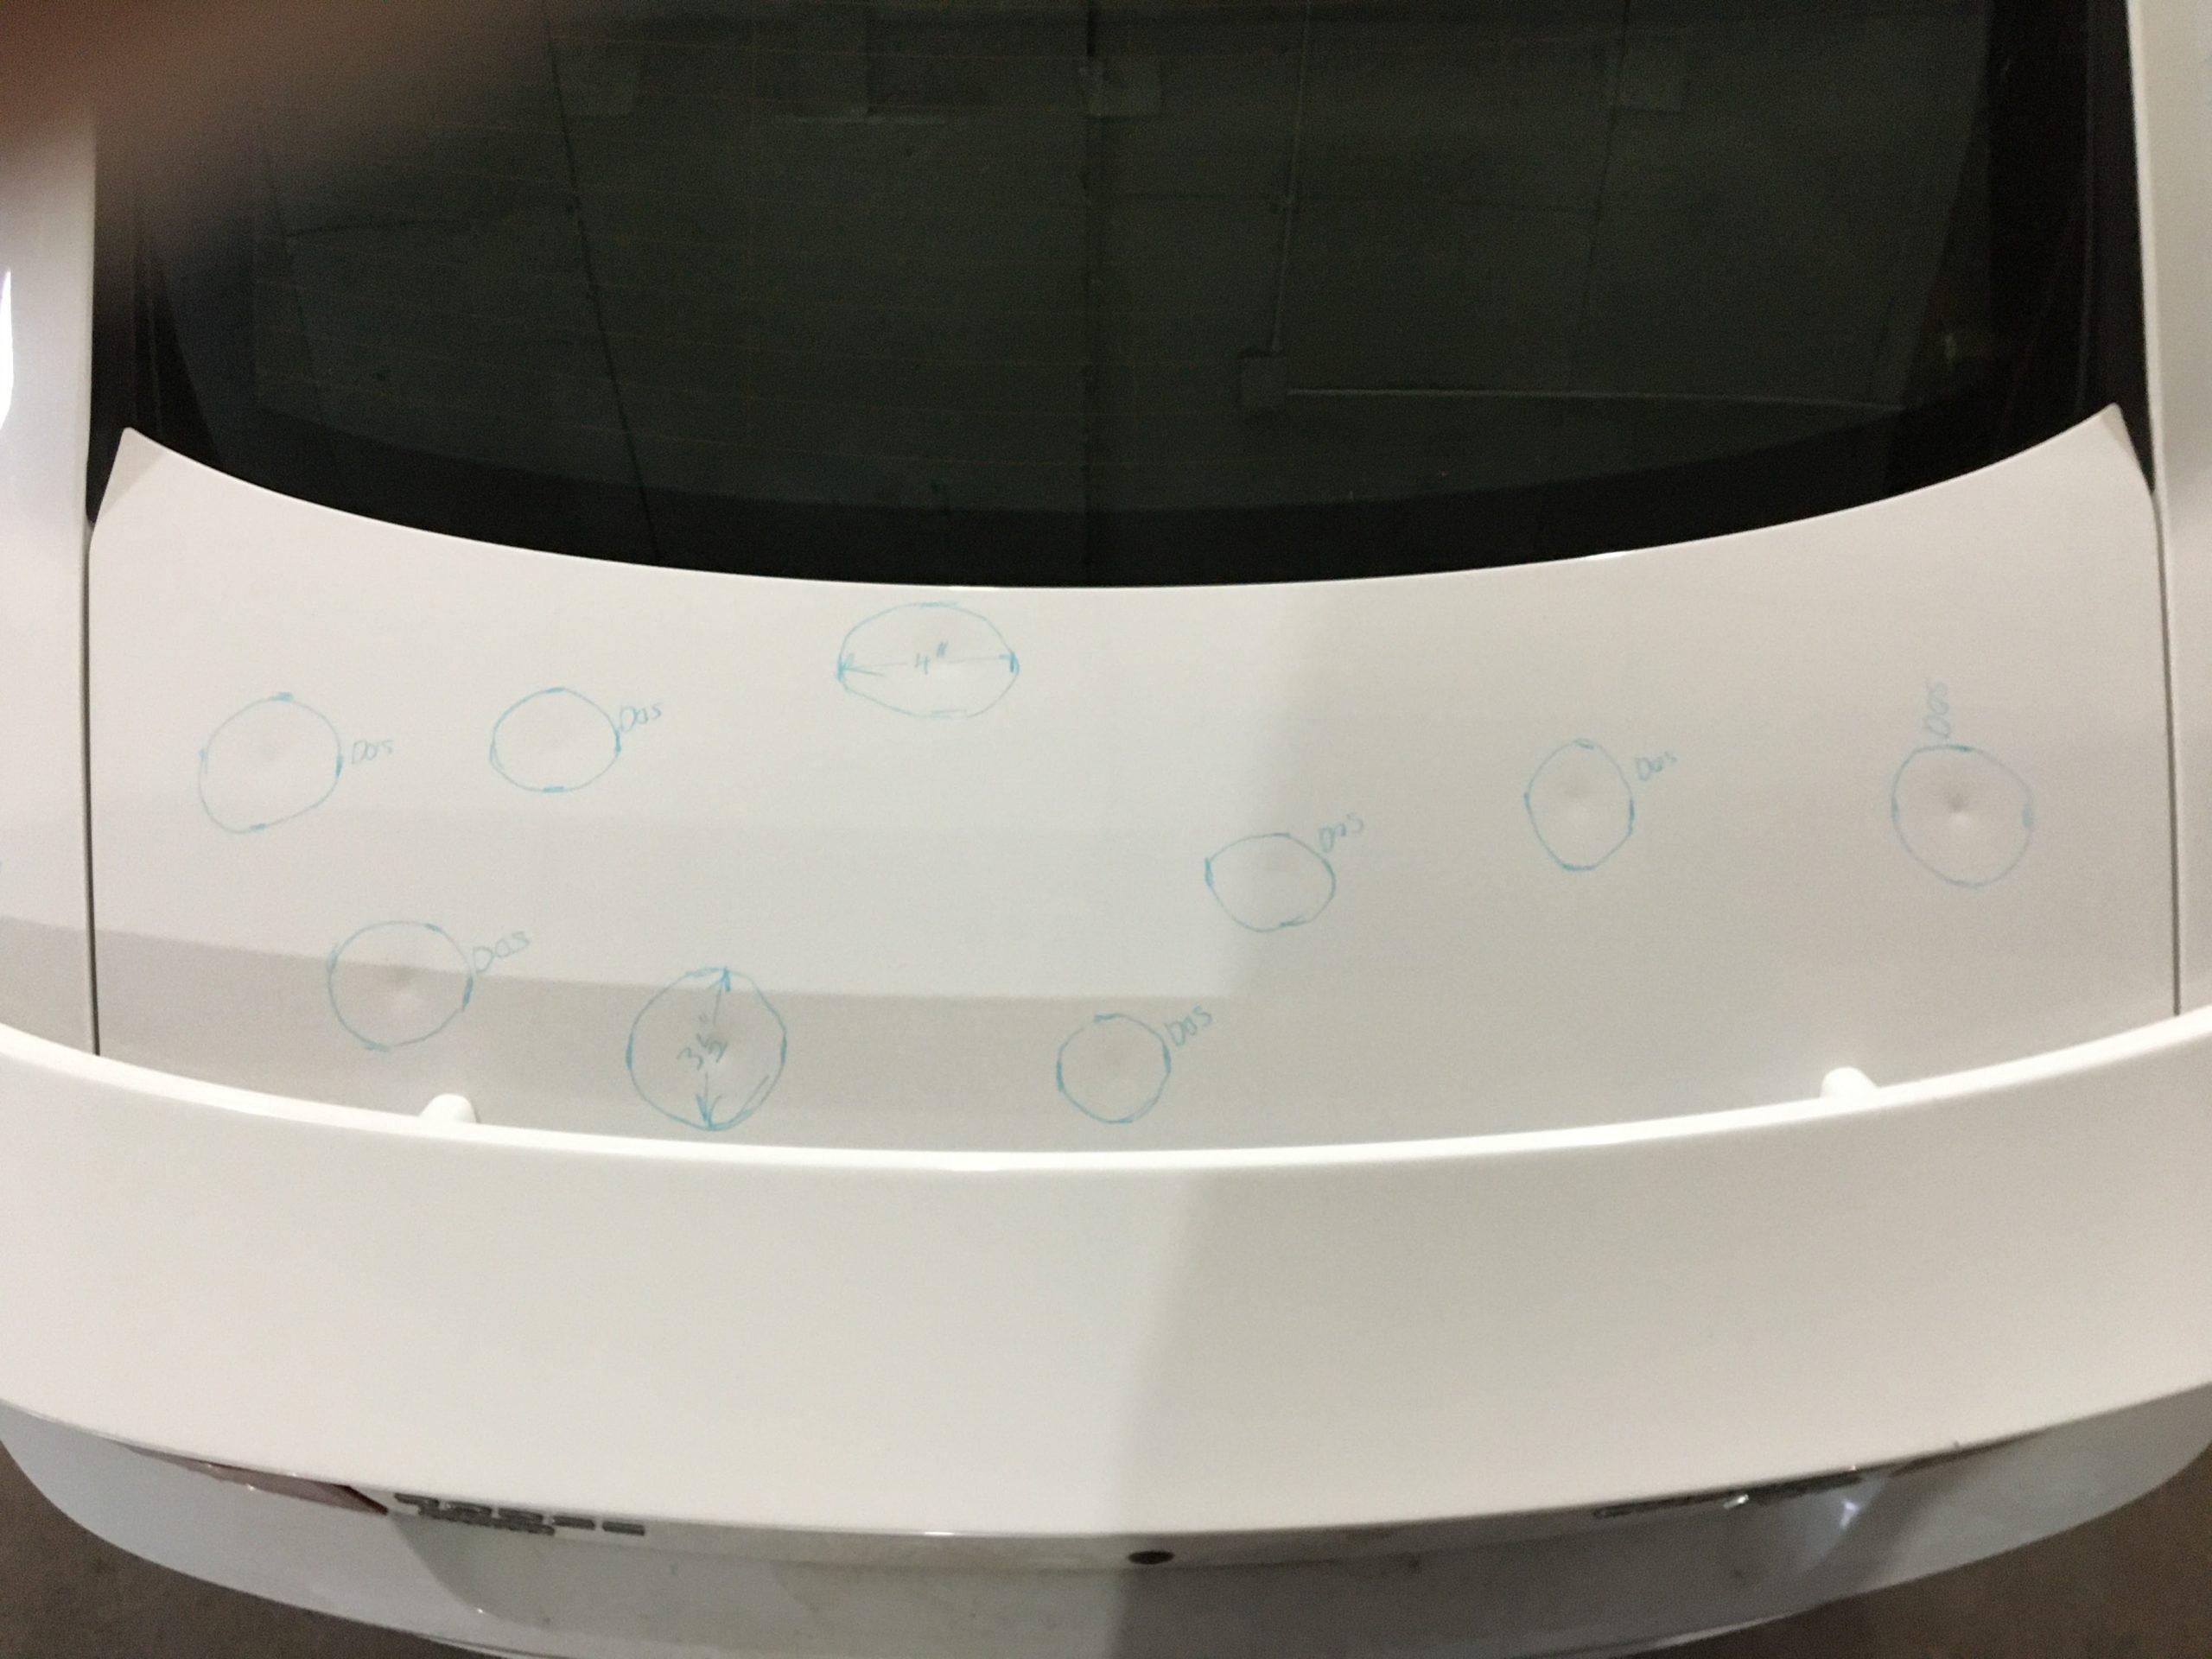 2010 Dodge Charger Hail Damage 1 scaled